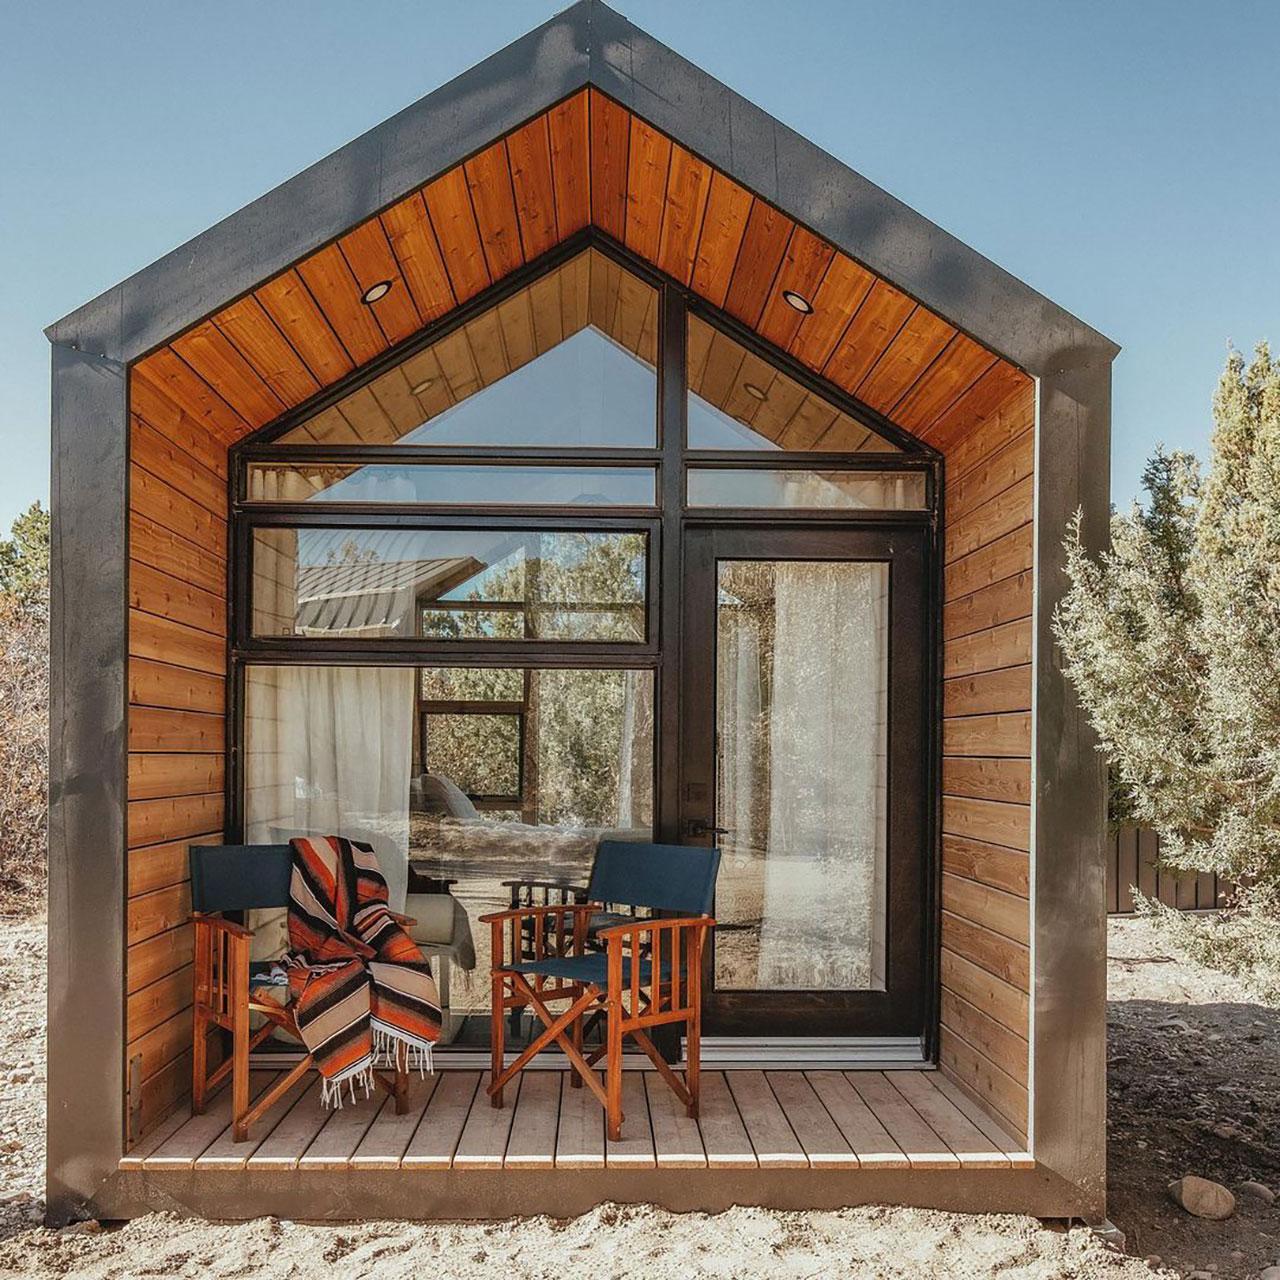 Cabin exterior.Photography by Aleks Danielle Butman.